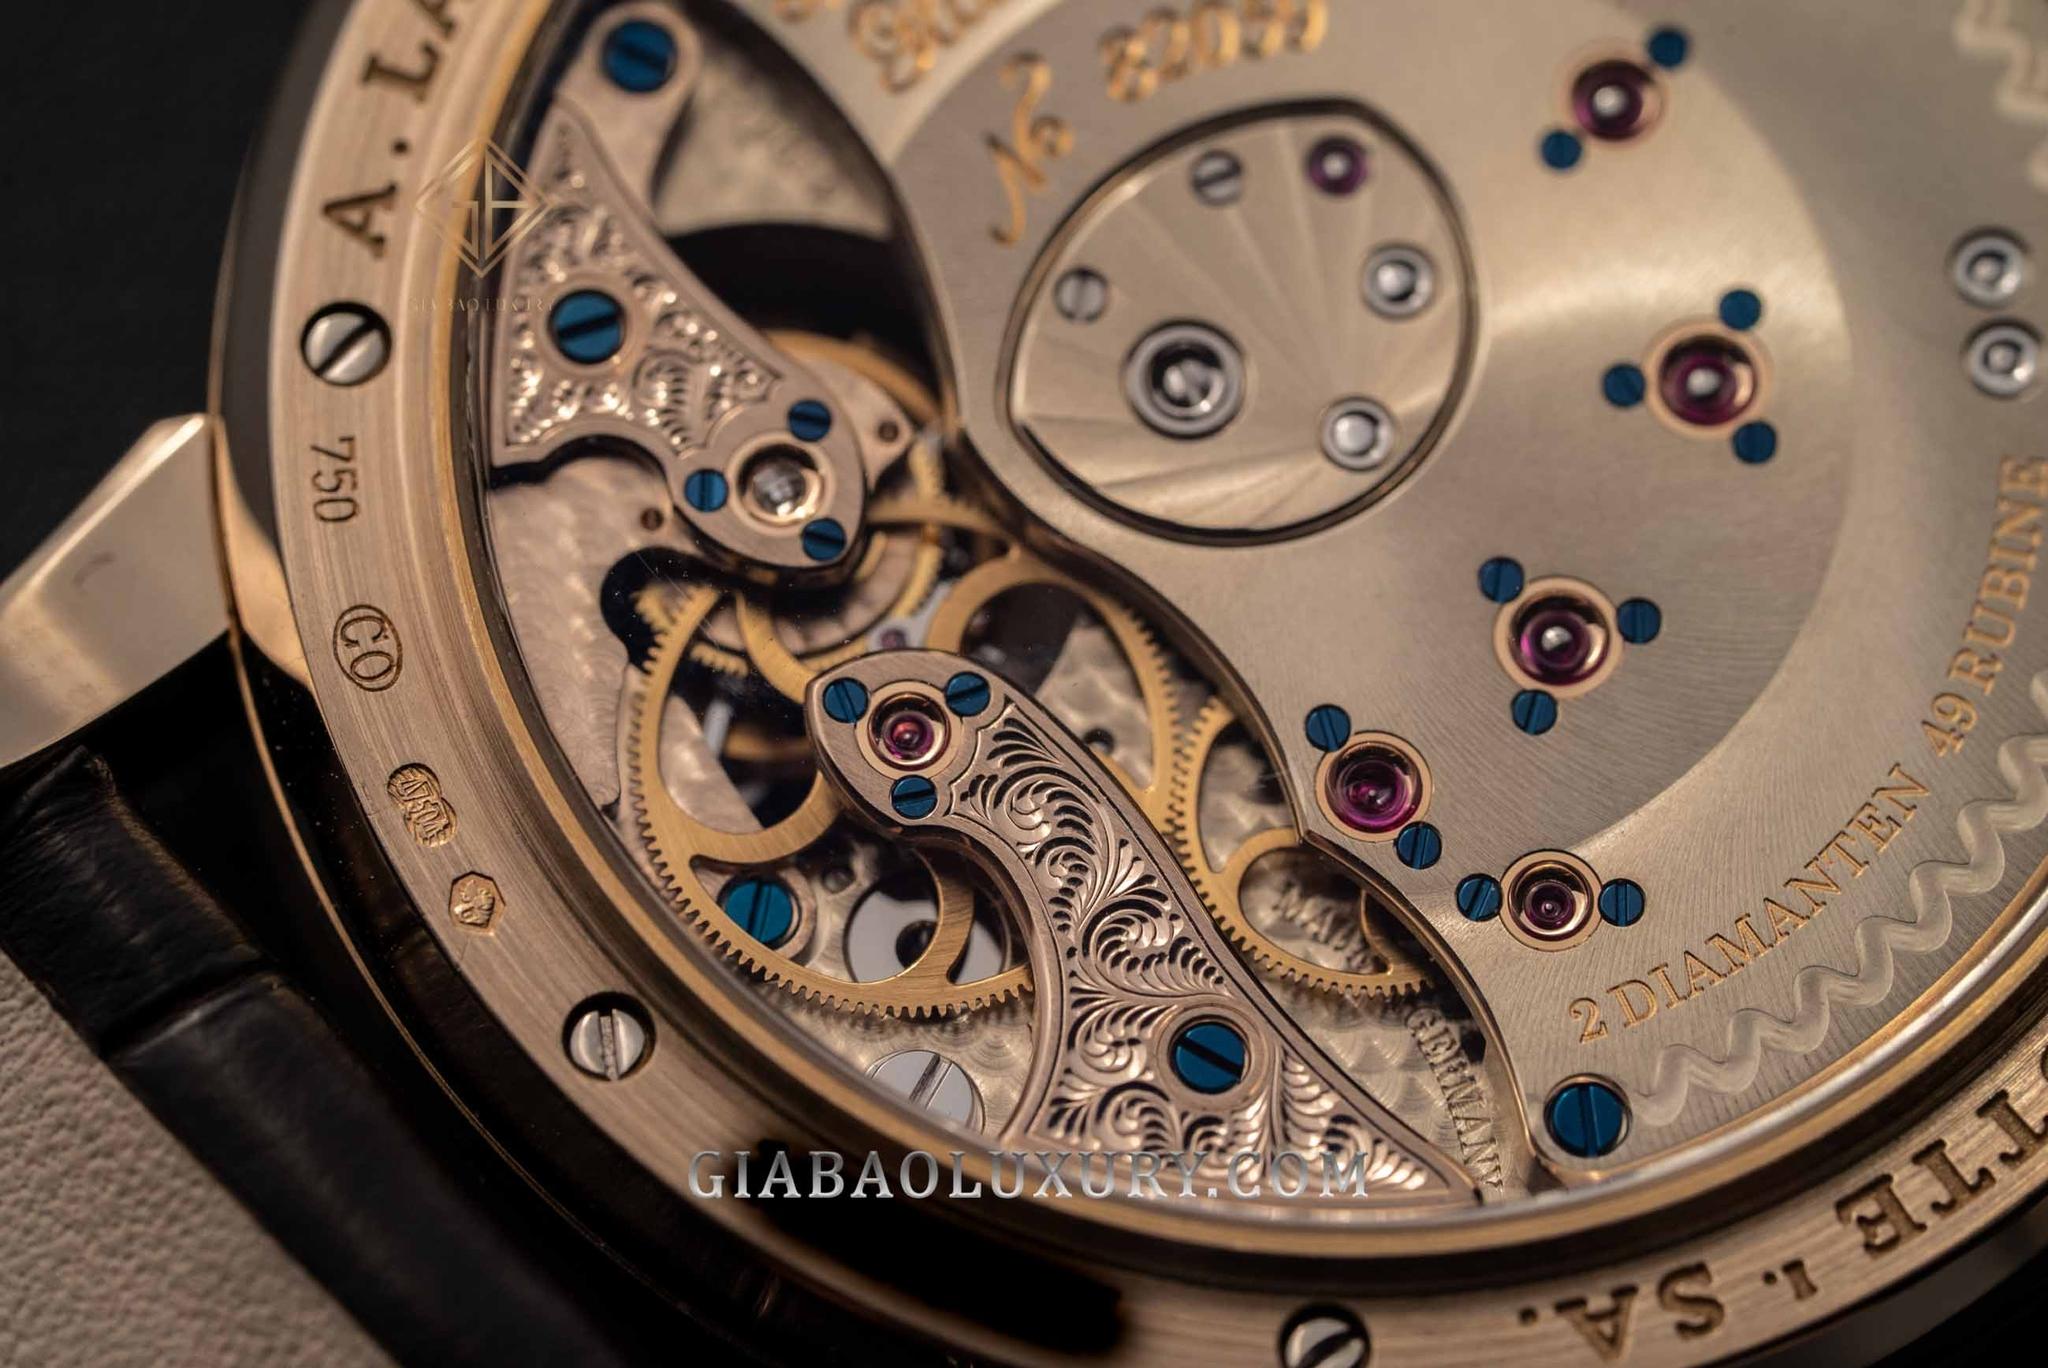 bộ máy đồng hồ A. Lange & Sohne Lange 1 Tourbillon ref. 722.050